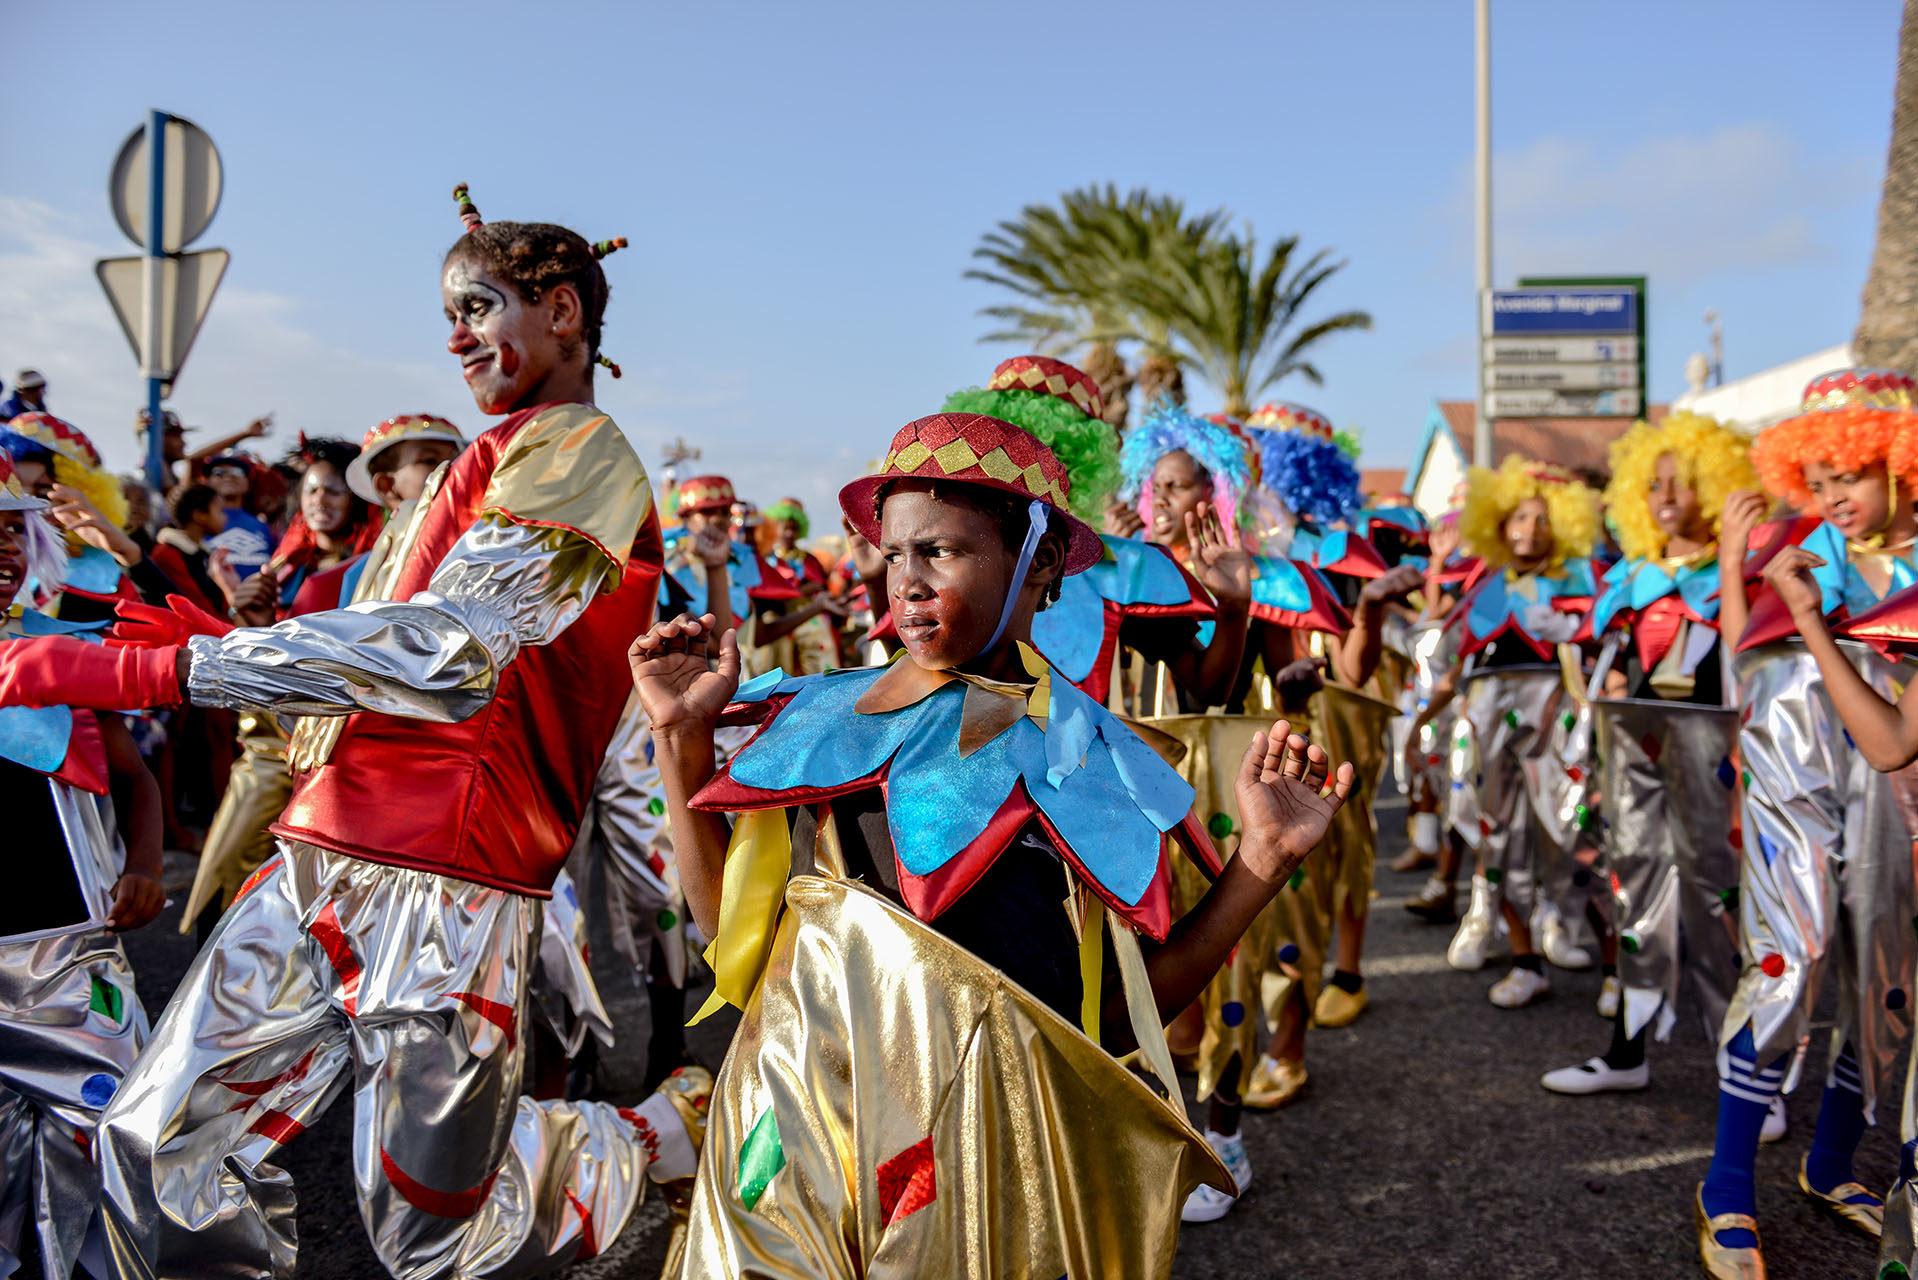 photographe-ile-de-france-evenementiel-maya-angelsen-carnaval-cap-vert-val-de-marne